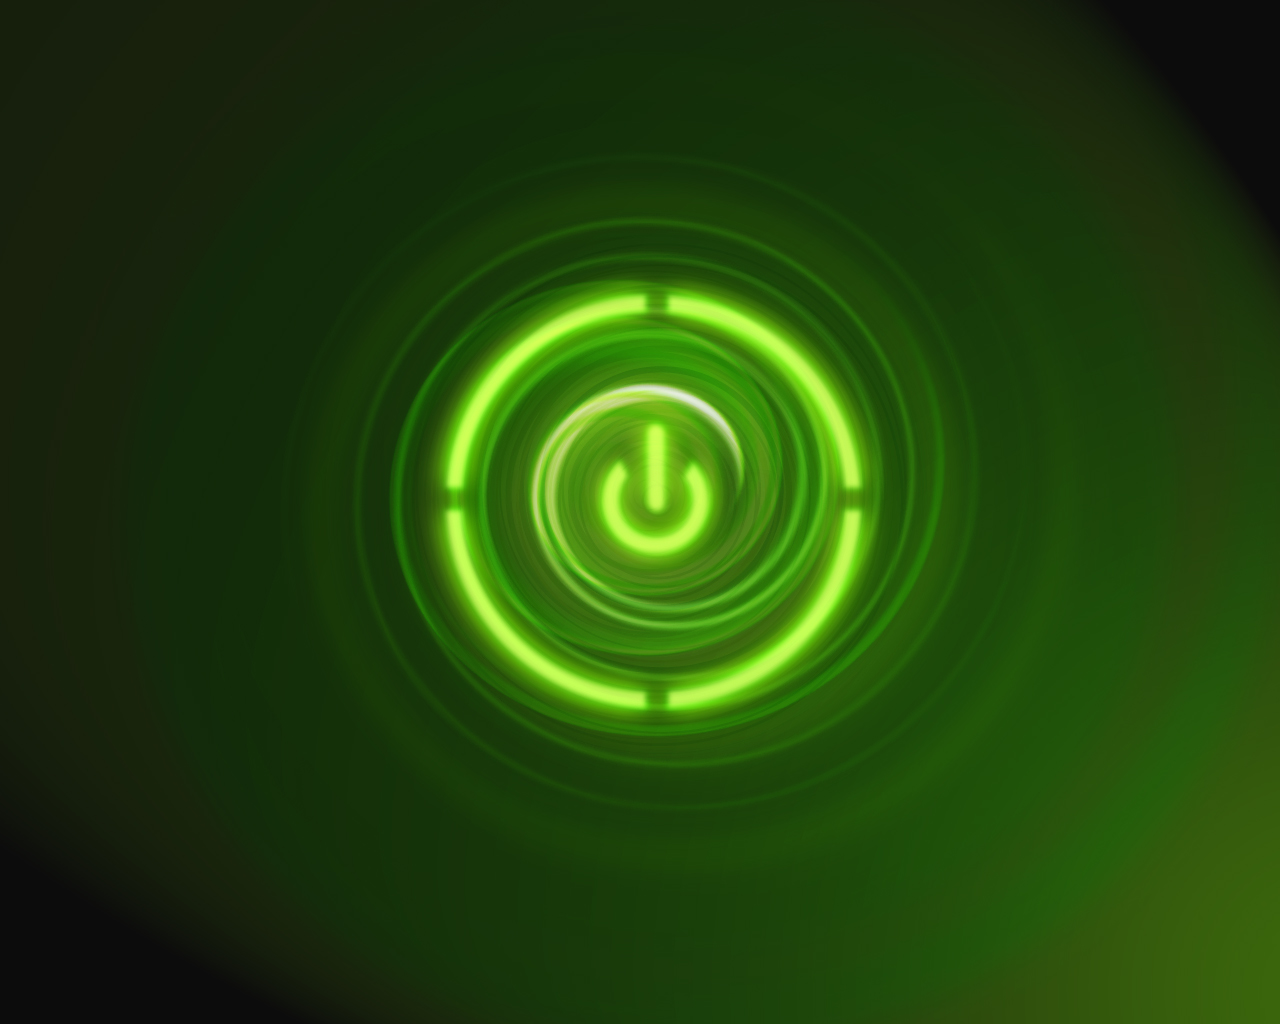 Xbox 360 wallpaper by nemethigabor 1280x1024